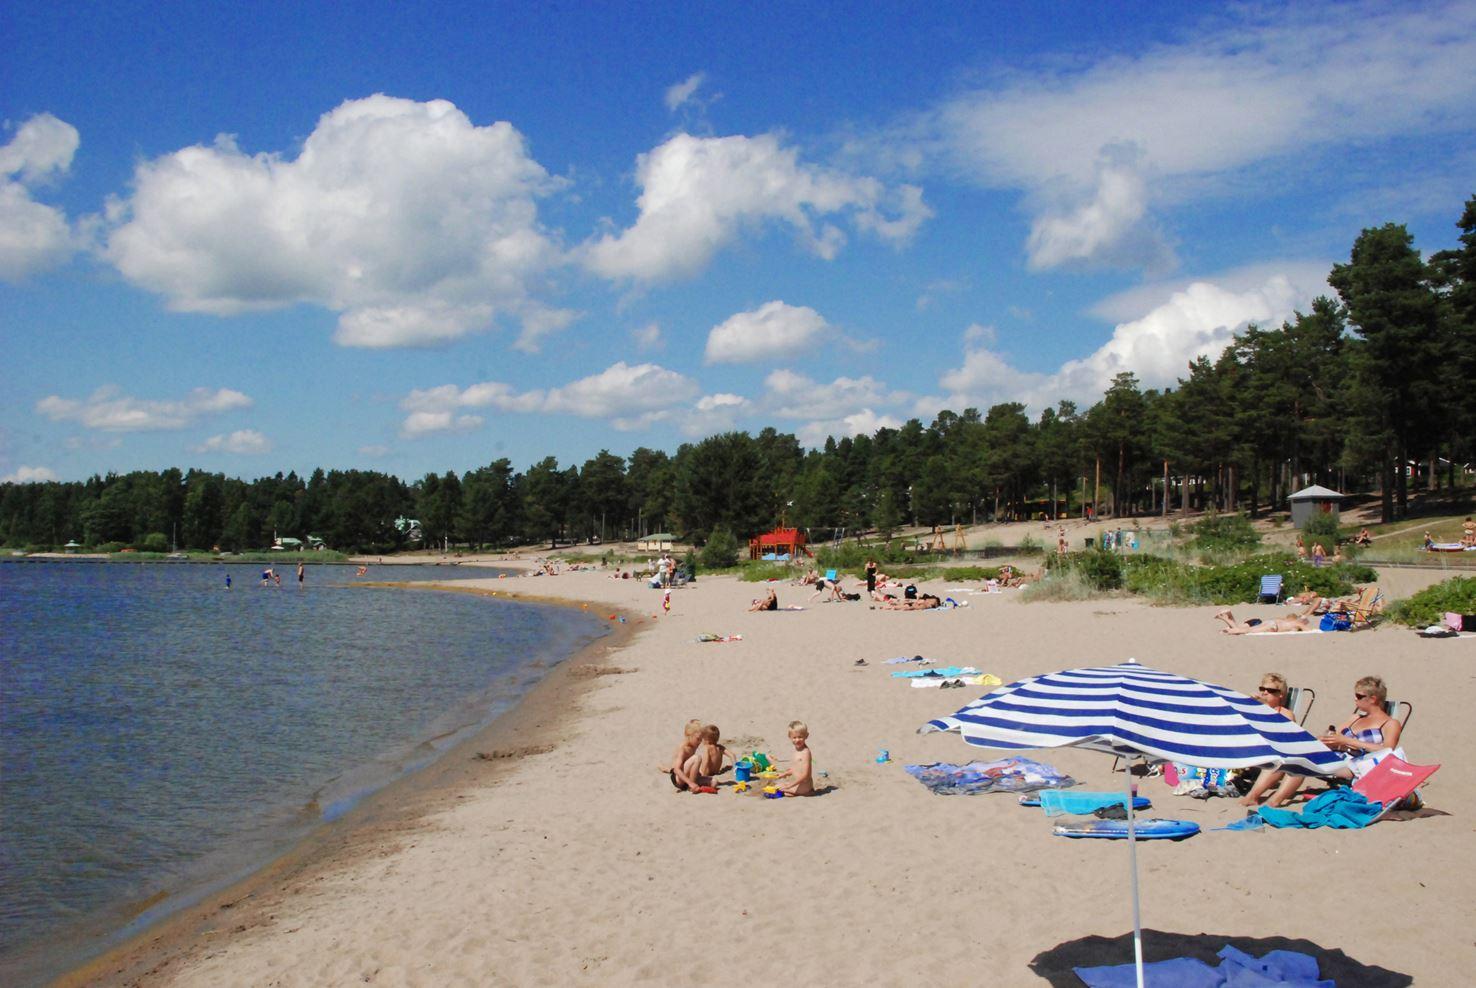 Malnbadens Camping/Stugor